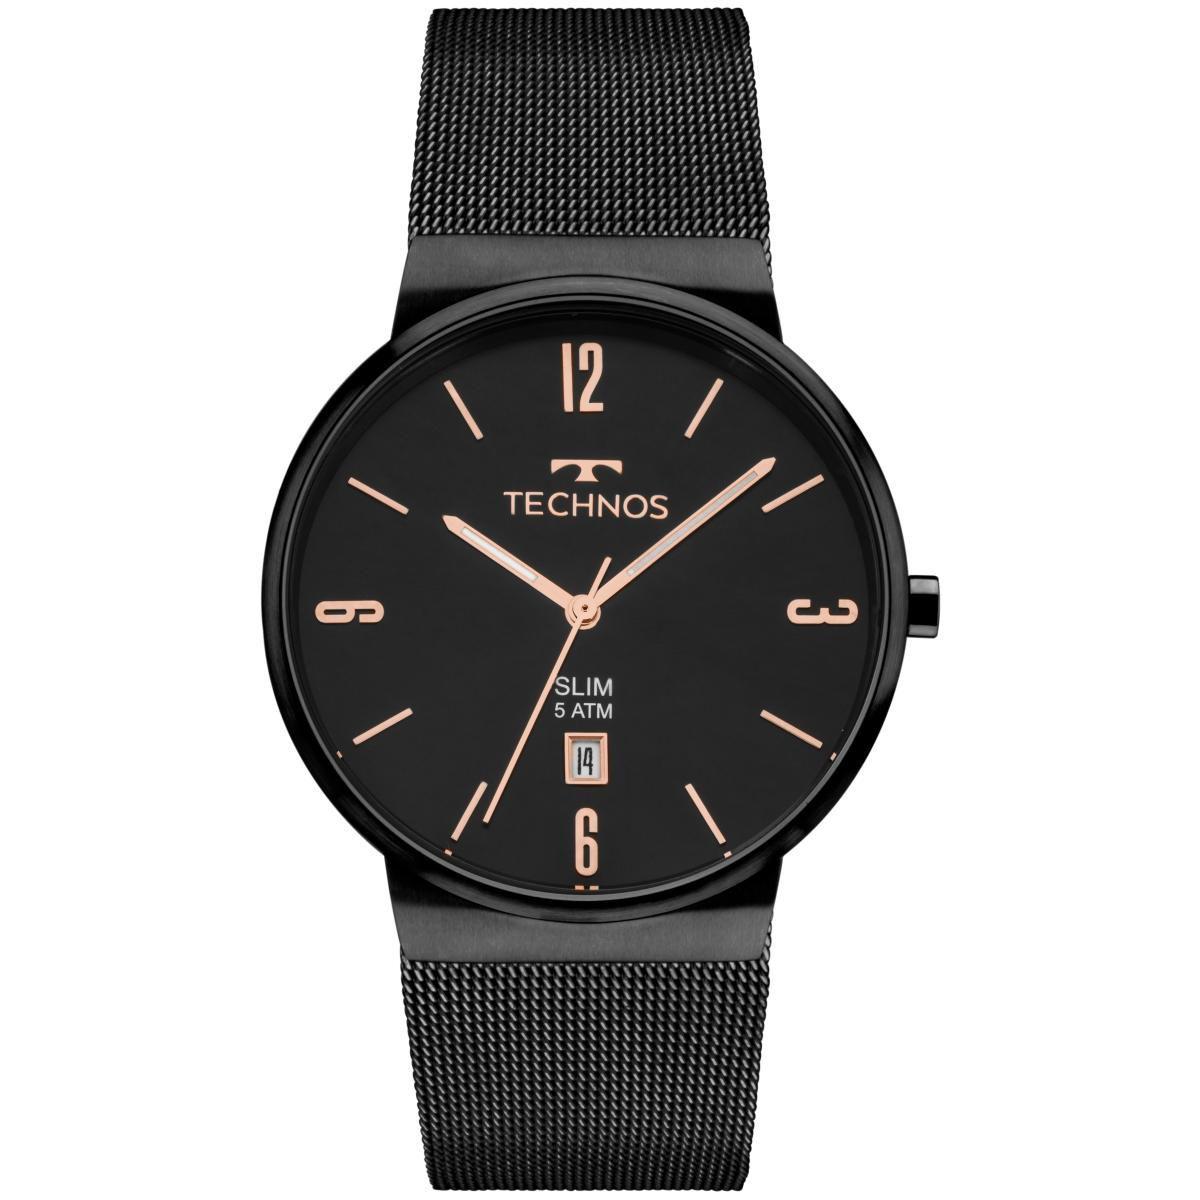 Relógio Unissex Technos Slim GM10YJ/4P 40mm Aço Preto